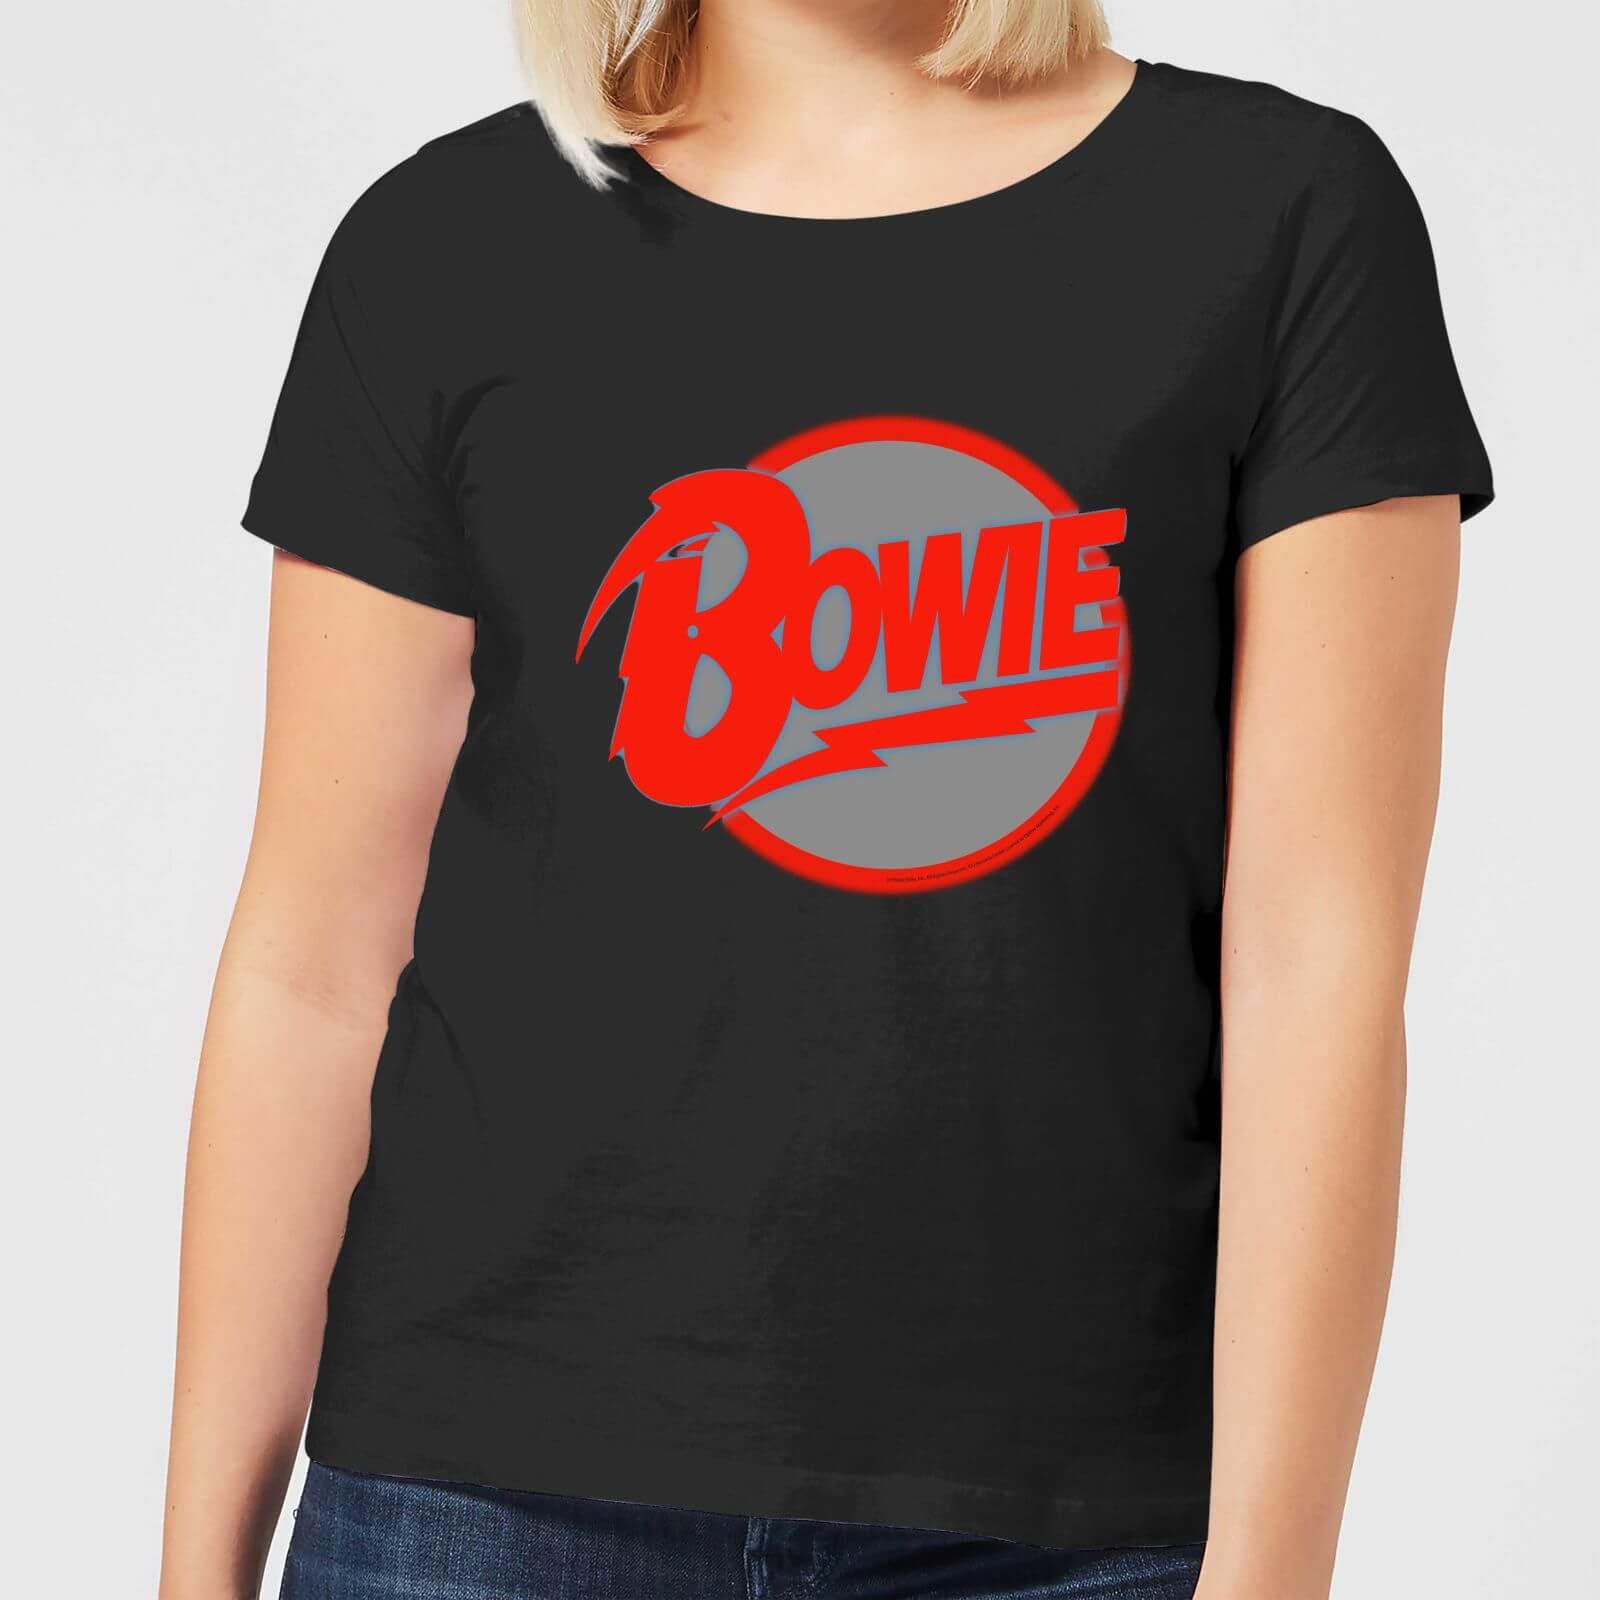 David Bowie Diamond Dogs Women's T-Shirt - Black - XL - Black